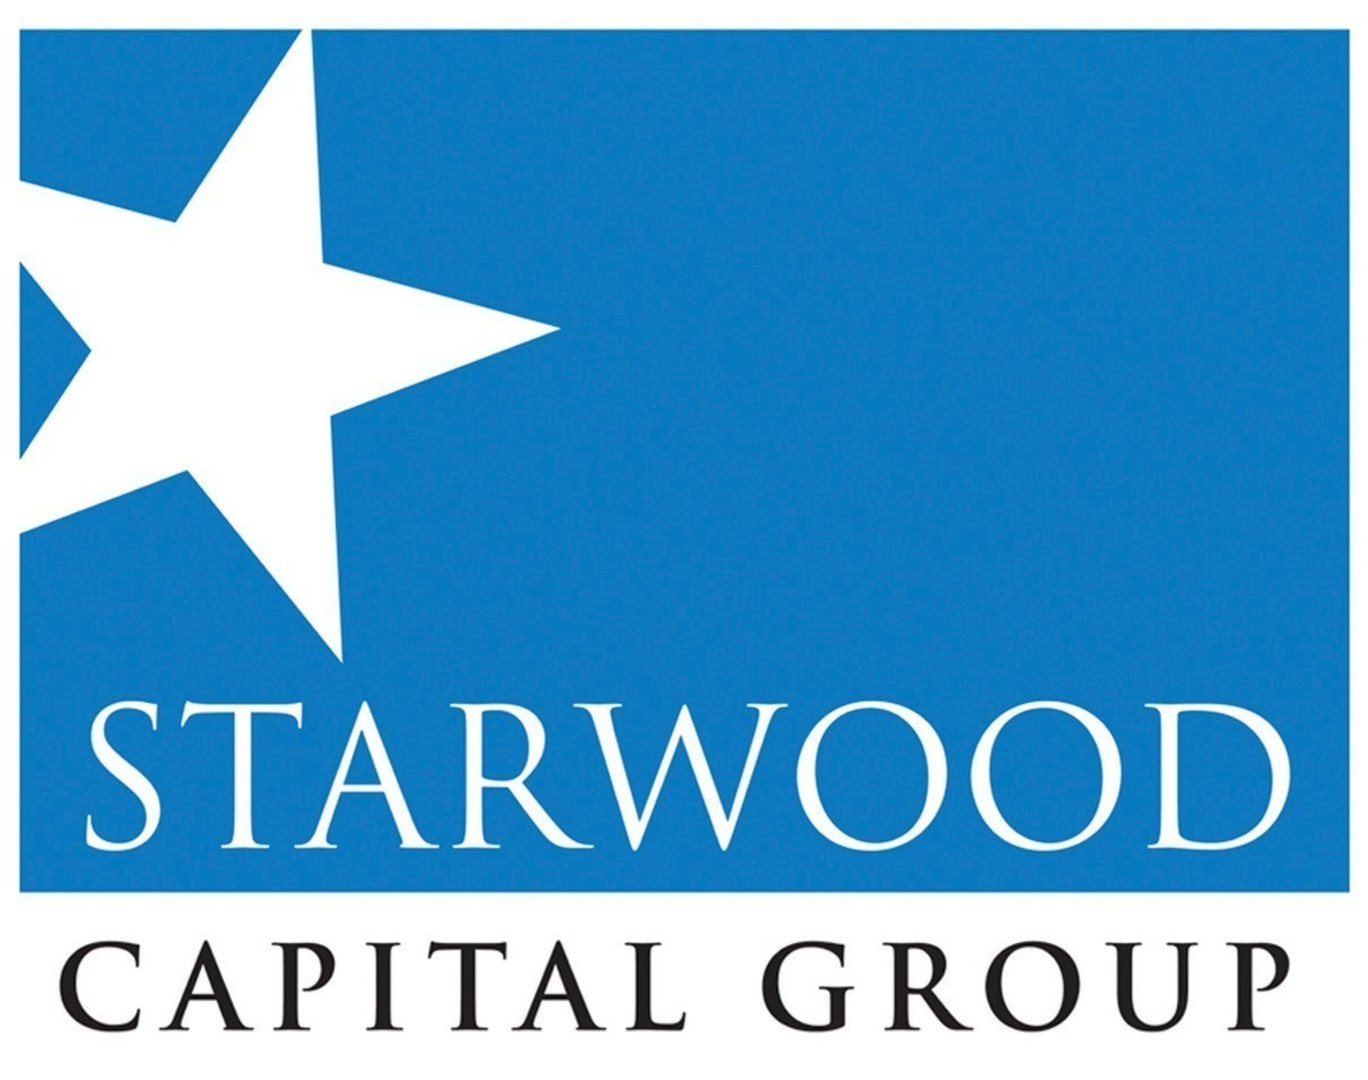 starwood-cg.jpg